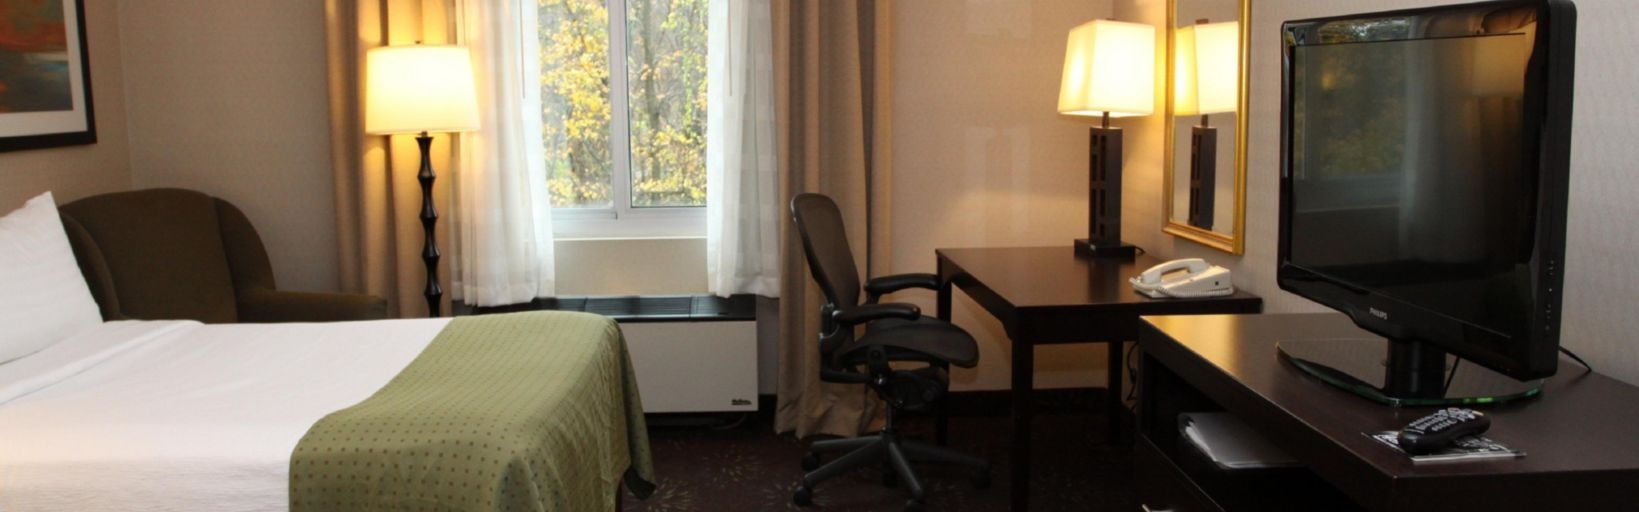 Hotels in Budd Lake, NJ | Holiday Inn Budd Lake - Rockaway Area | IHG